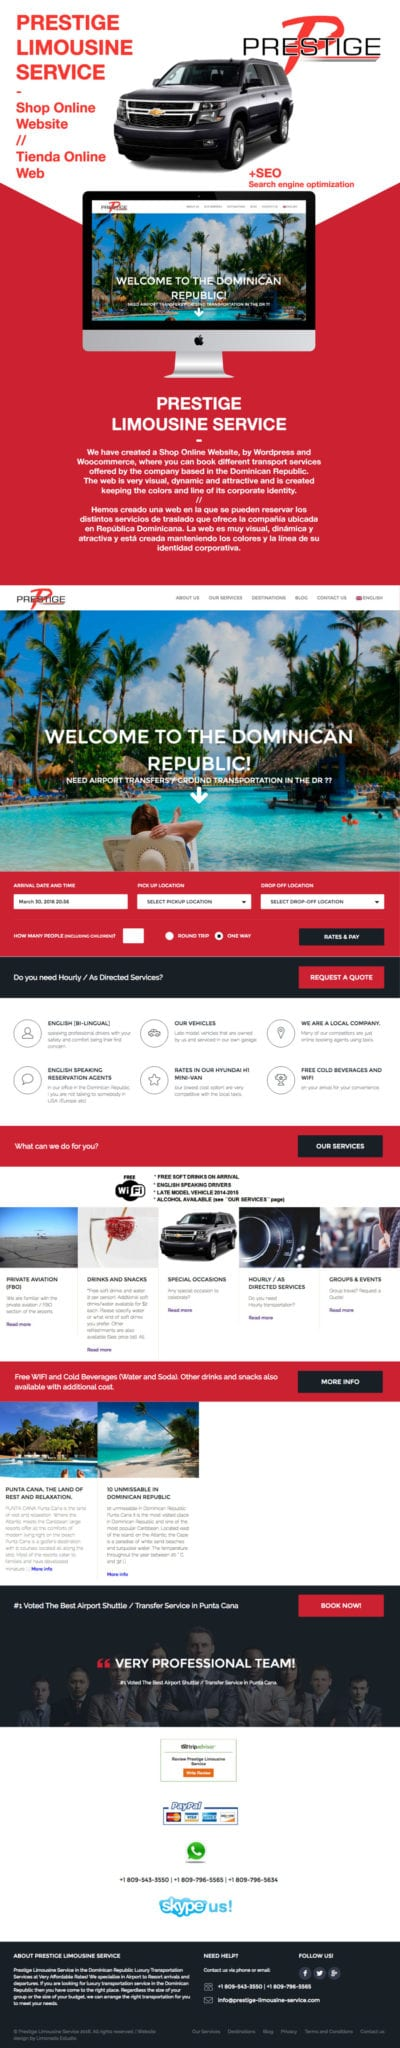 prestige-homepage-web